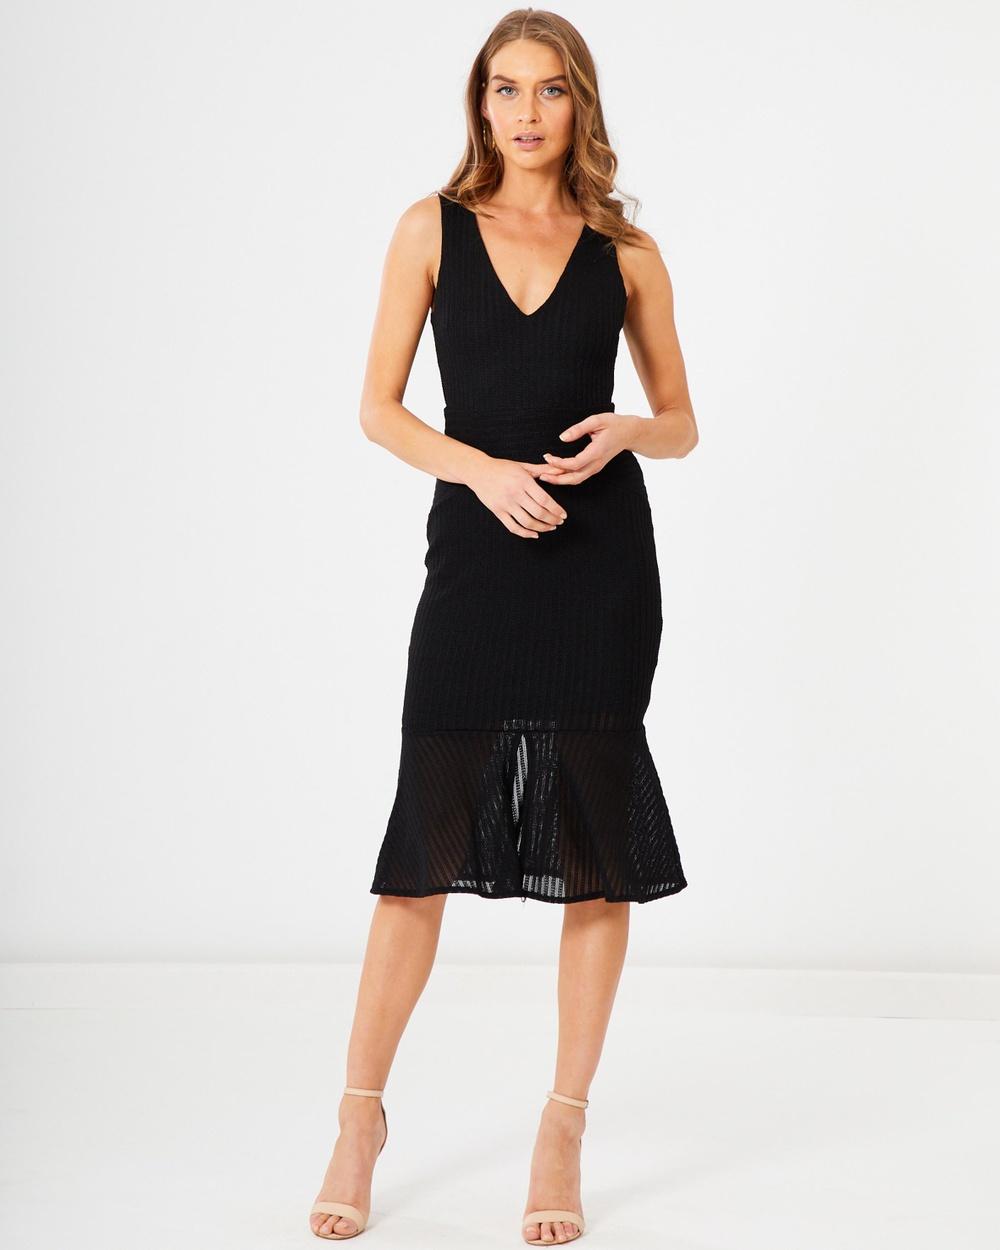 Photo of Tussah Black Jacinda Midi Dress - beautiful dress from Tussah online